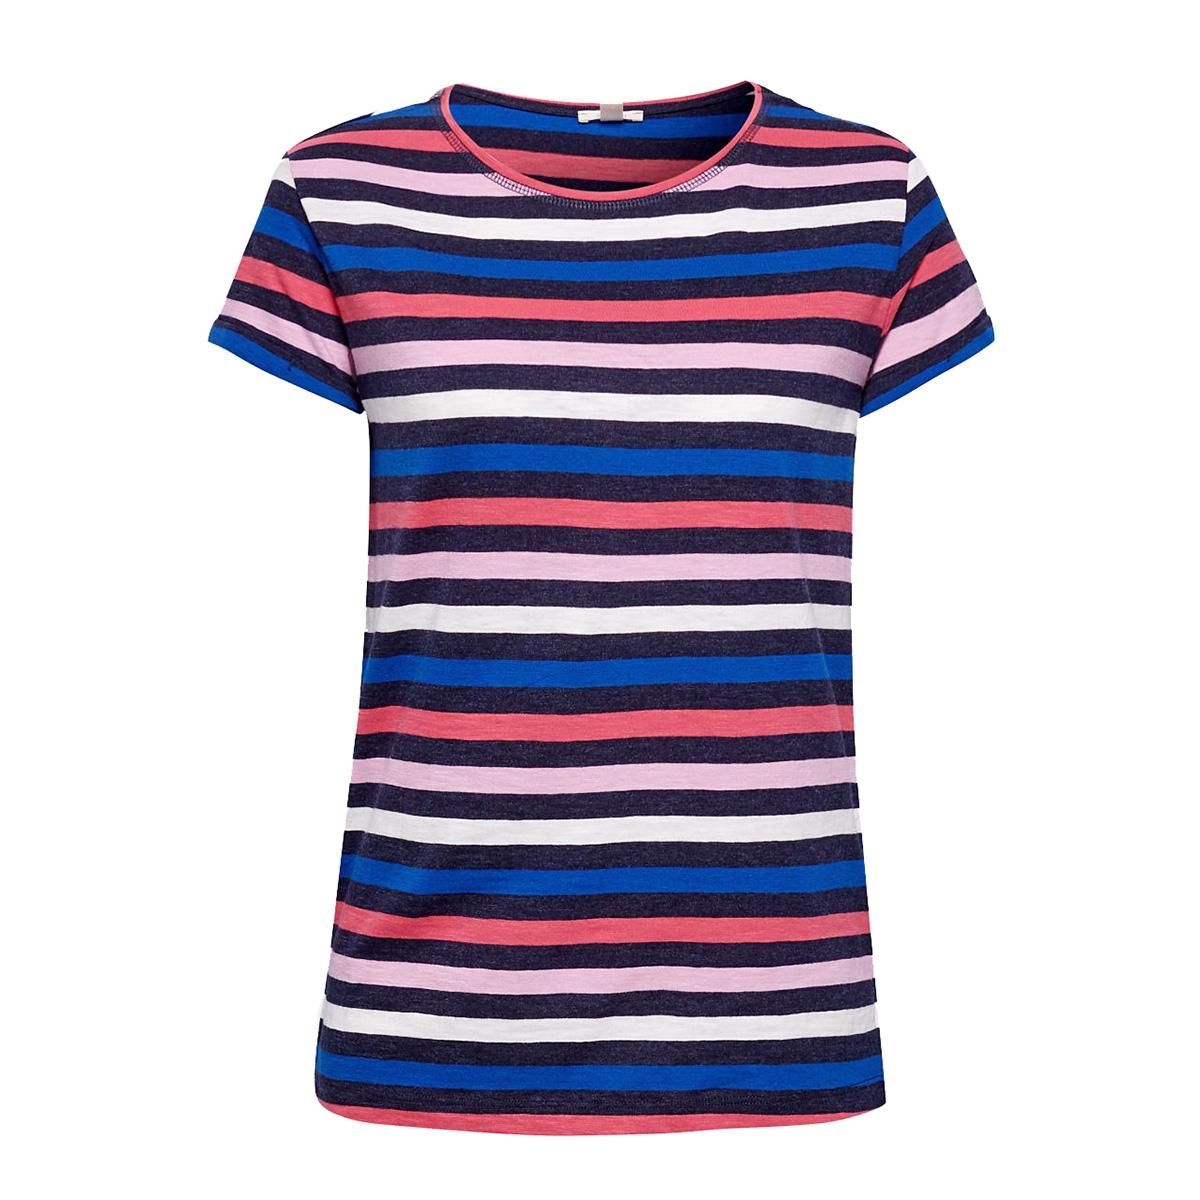 gestreept shirt met slubstructuur 049ee1k044 esprit t-shirt e400